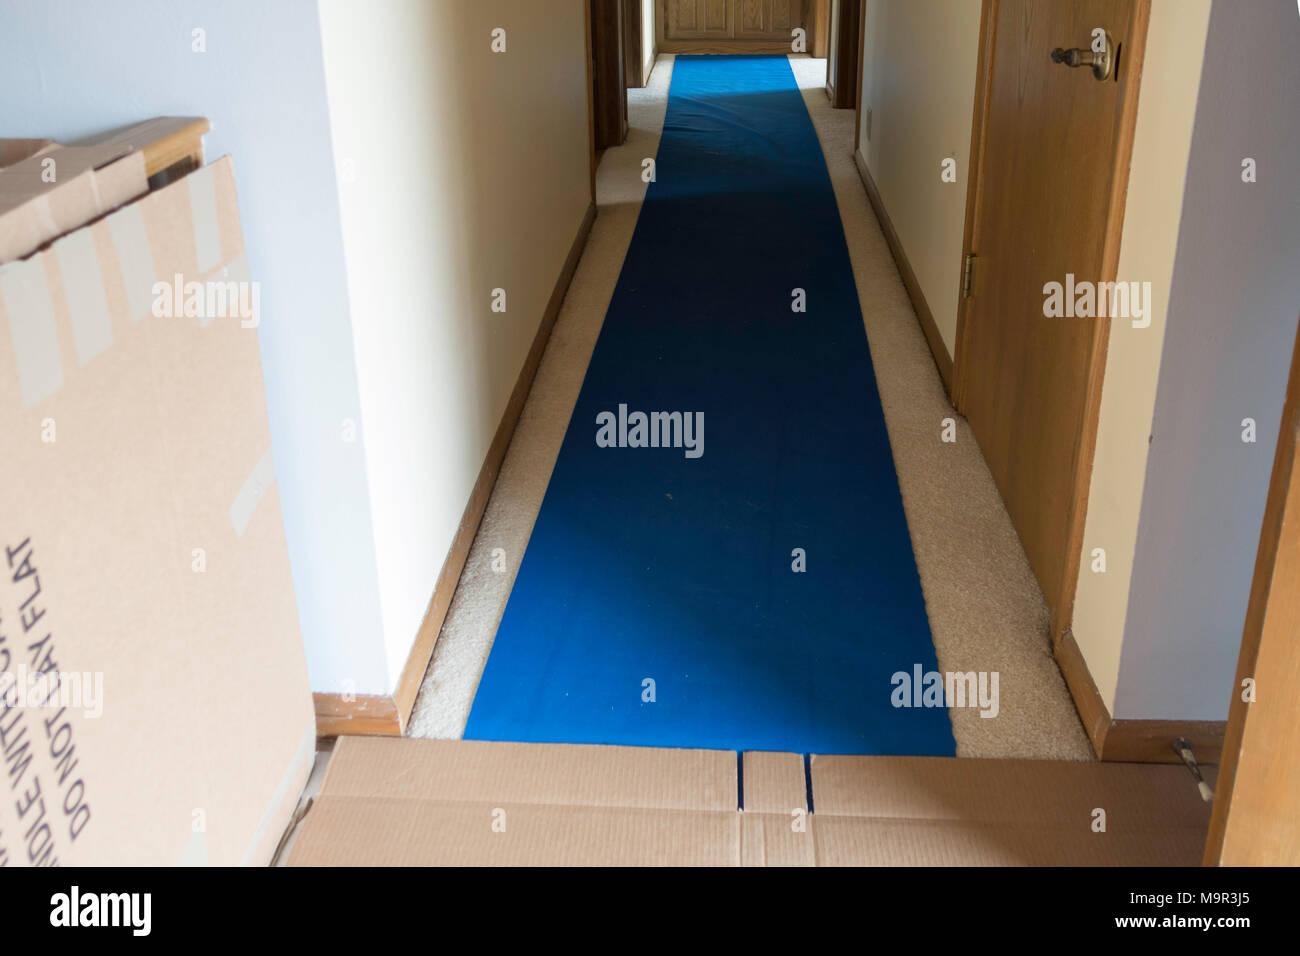 Blue Plastic Floor Runner And Flattened Cardboard Boxes Laid